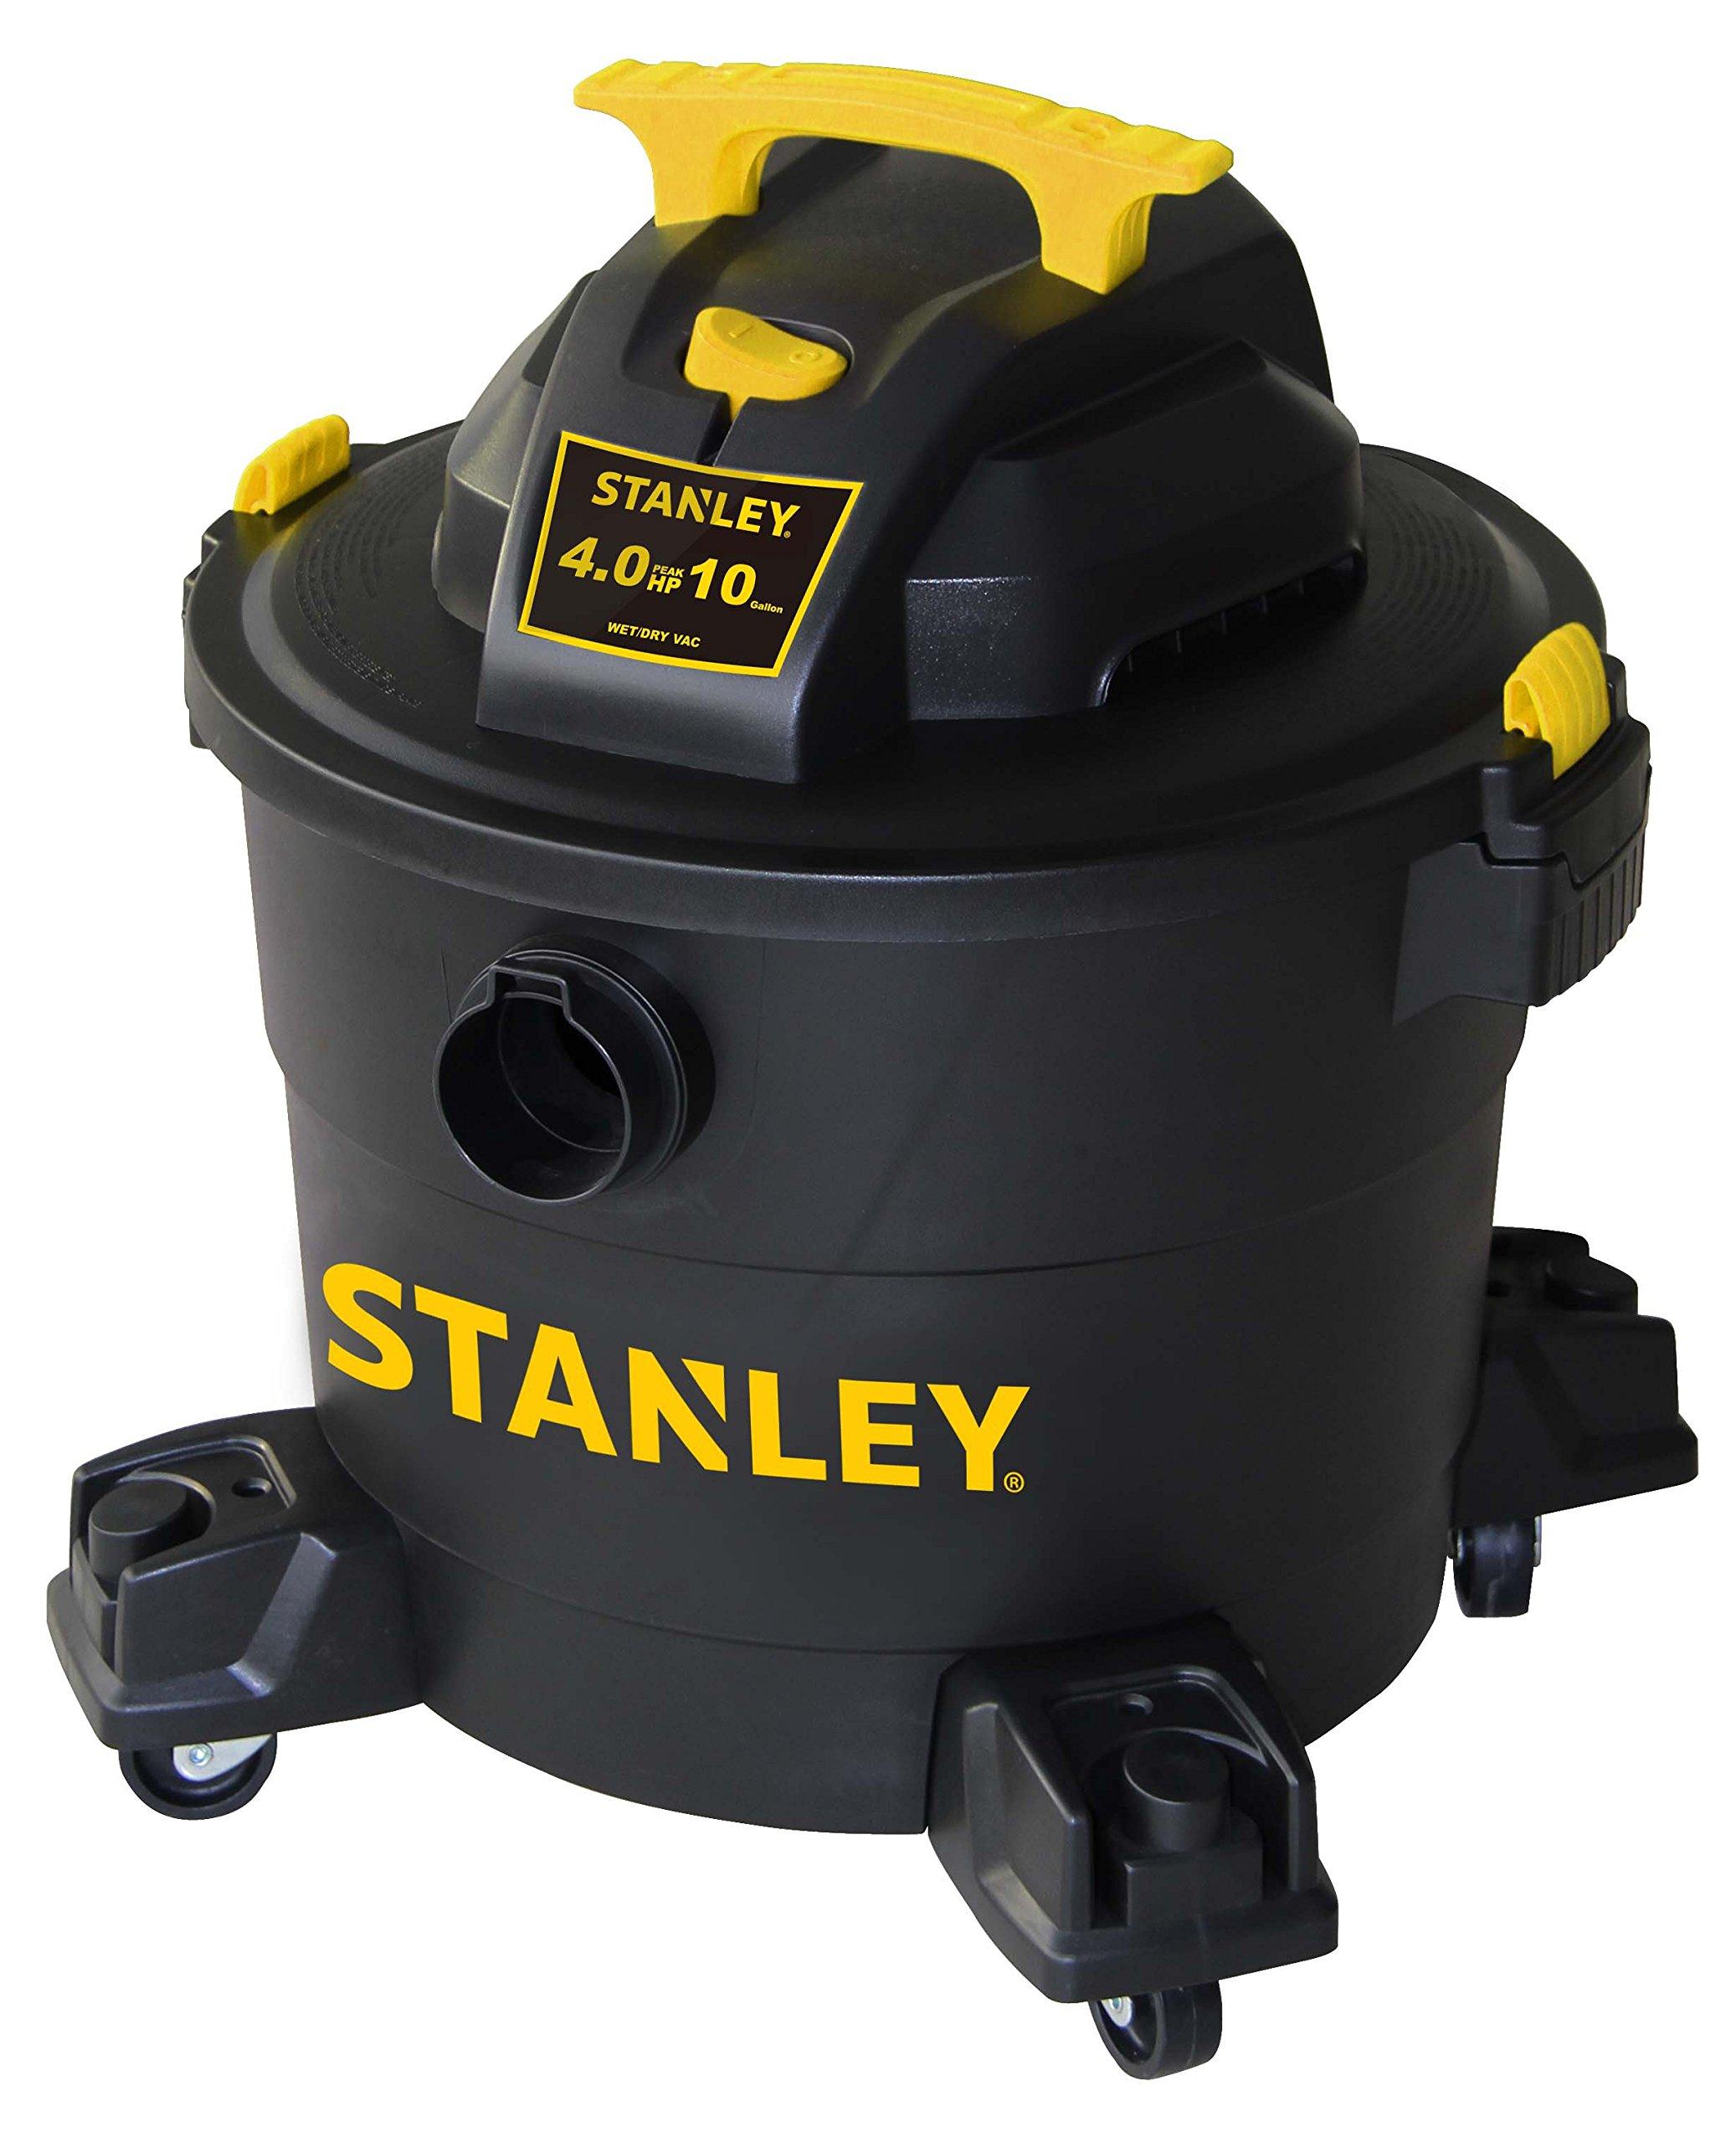 Stanley Wet/Dry Vacuum, 10 Gallon, 4 Horsepower by Stanley